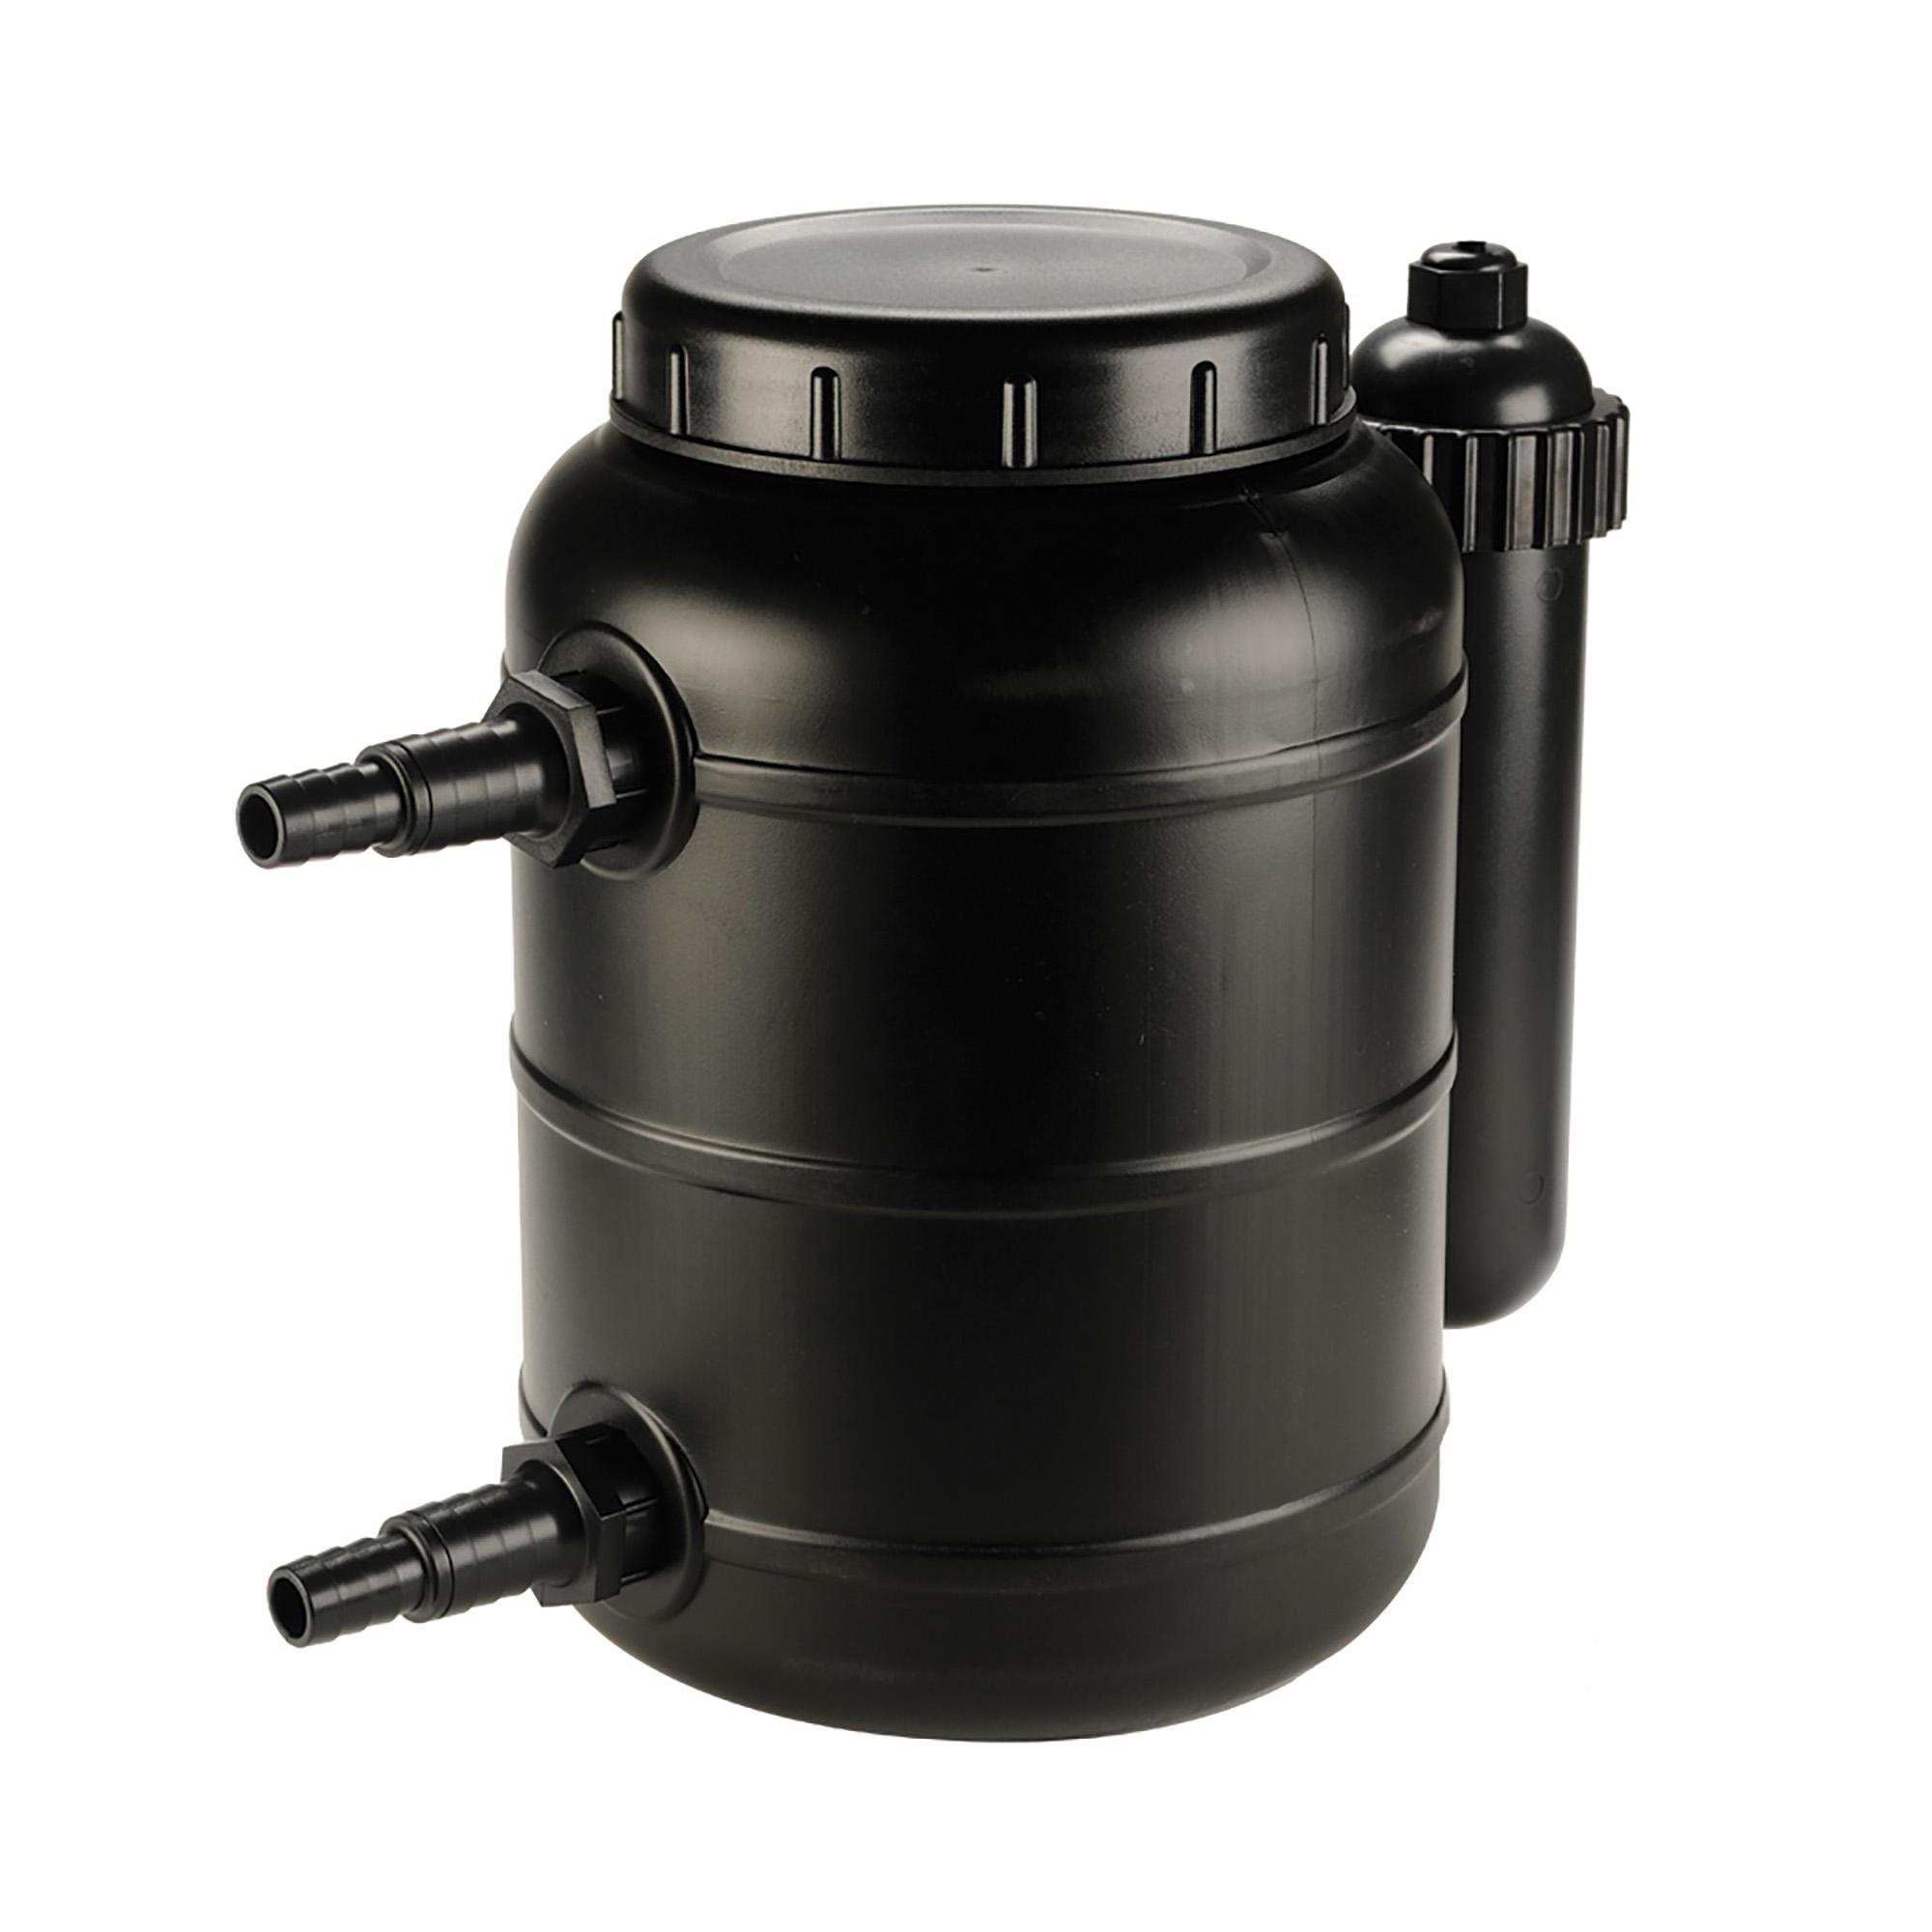 Black AQUANIQUE 52560 UV Pond Clarifier